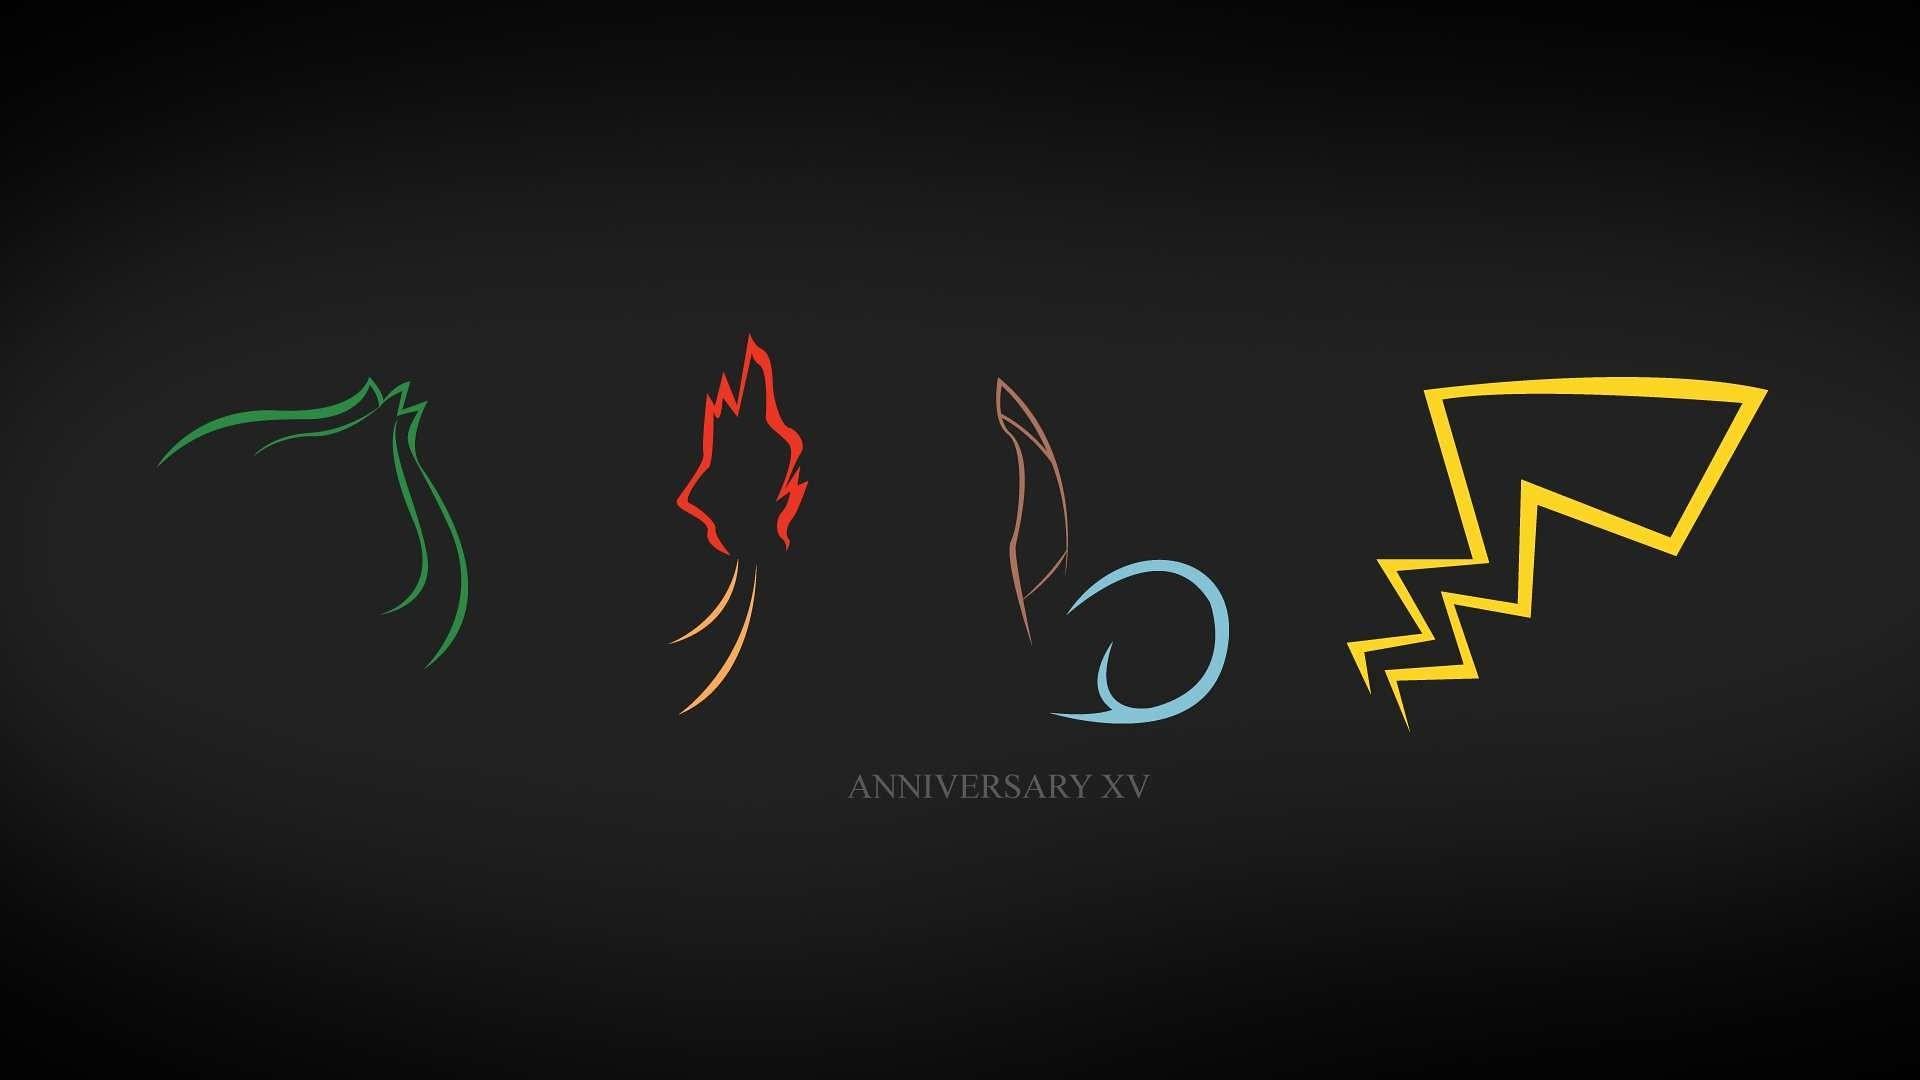 Pokemon Anniversary XV Pokemon Anniversary XV HD Wallpaper